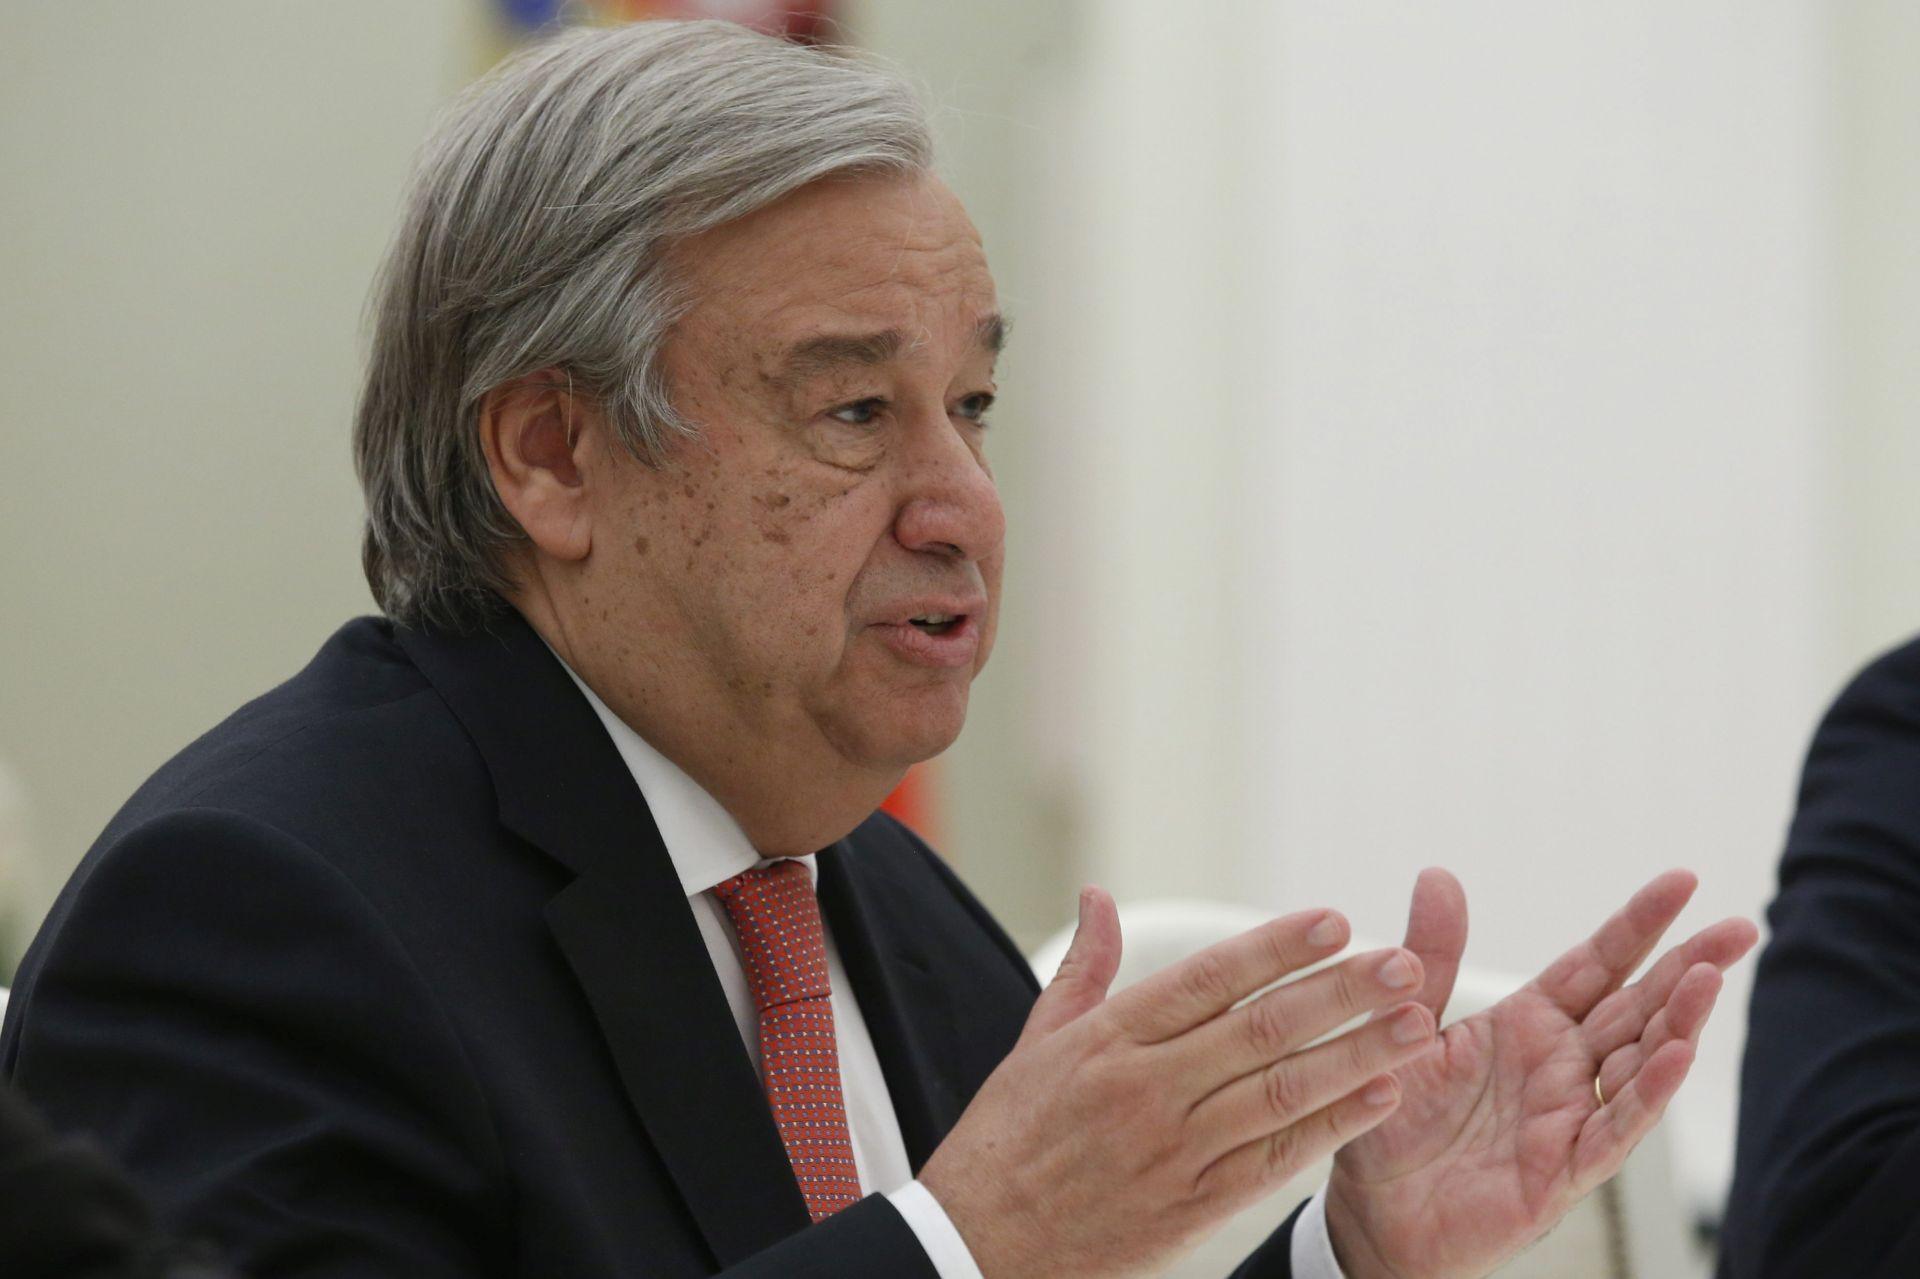 VIDEO: Kratki intervju s Antoniom Guterresom, glavnim tajnikom UN-a